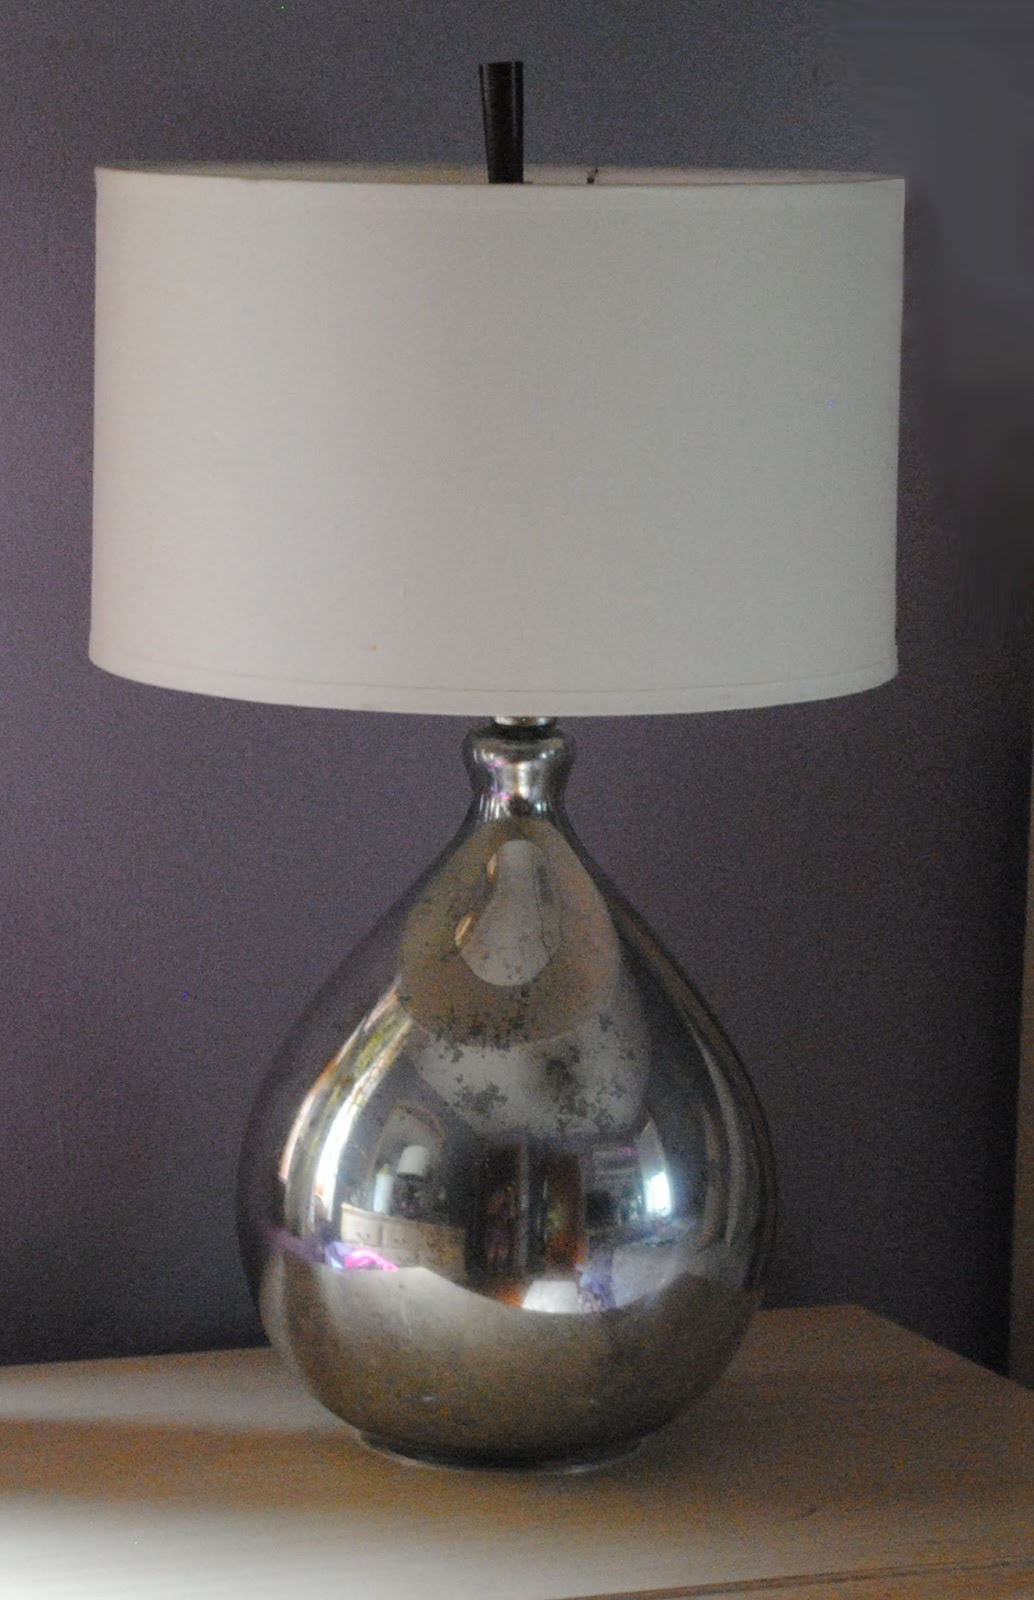 themecontrol product horoz lamp nikomlight mercury lamps en hl